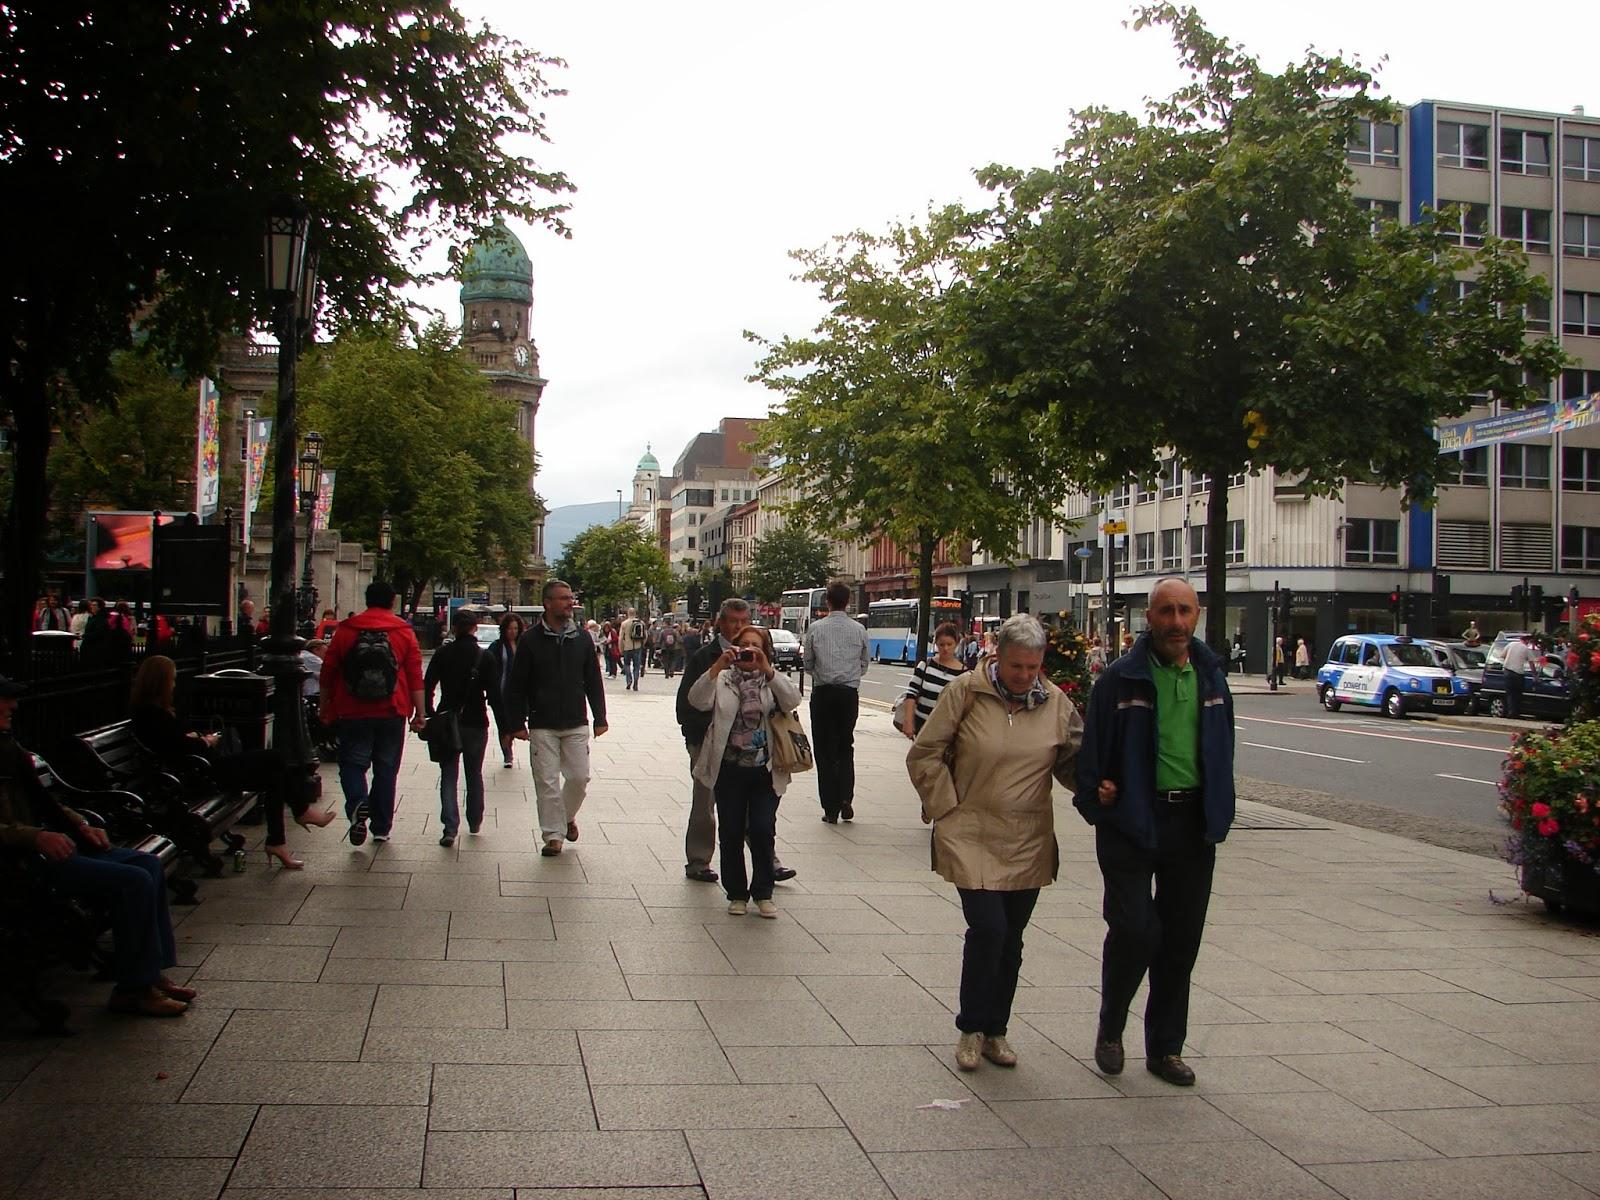 Rúa céntrica de Belfast (XMLS)